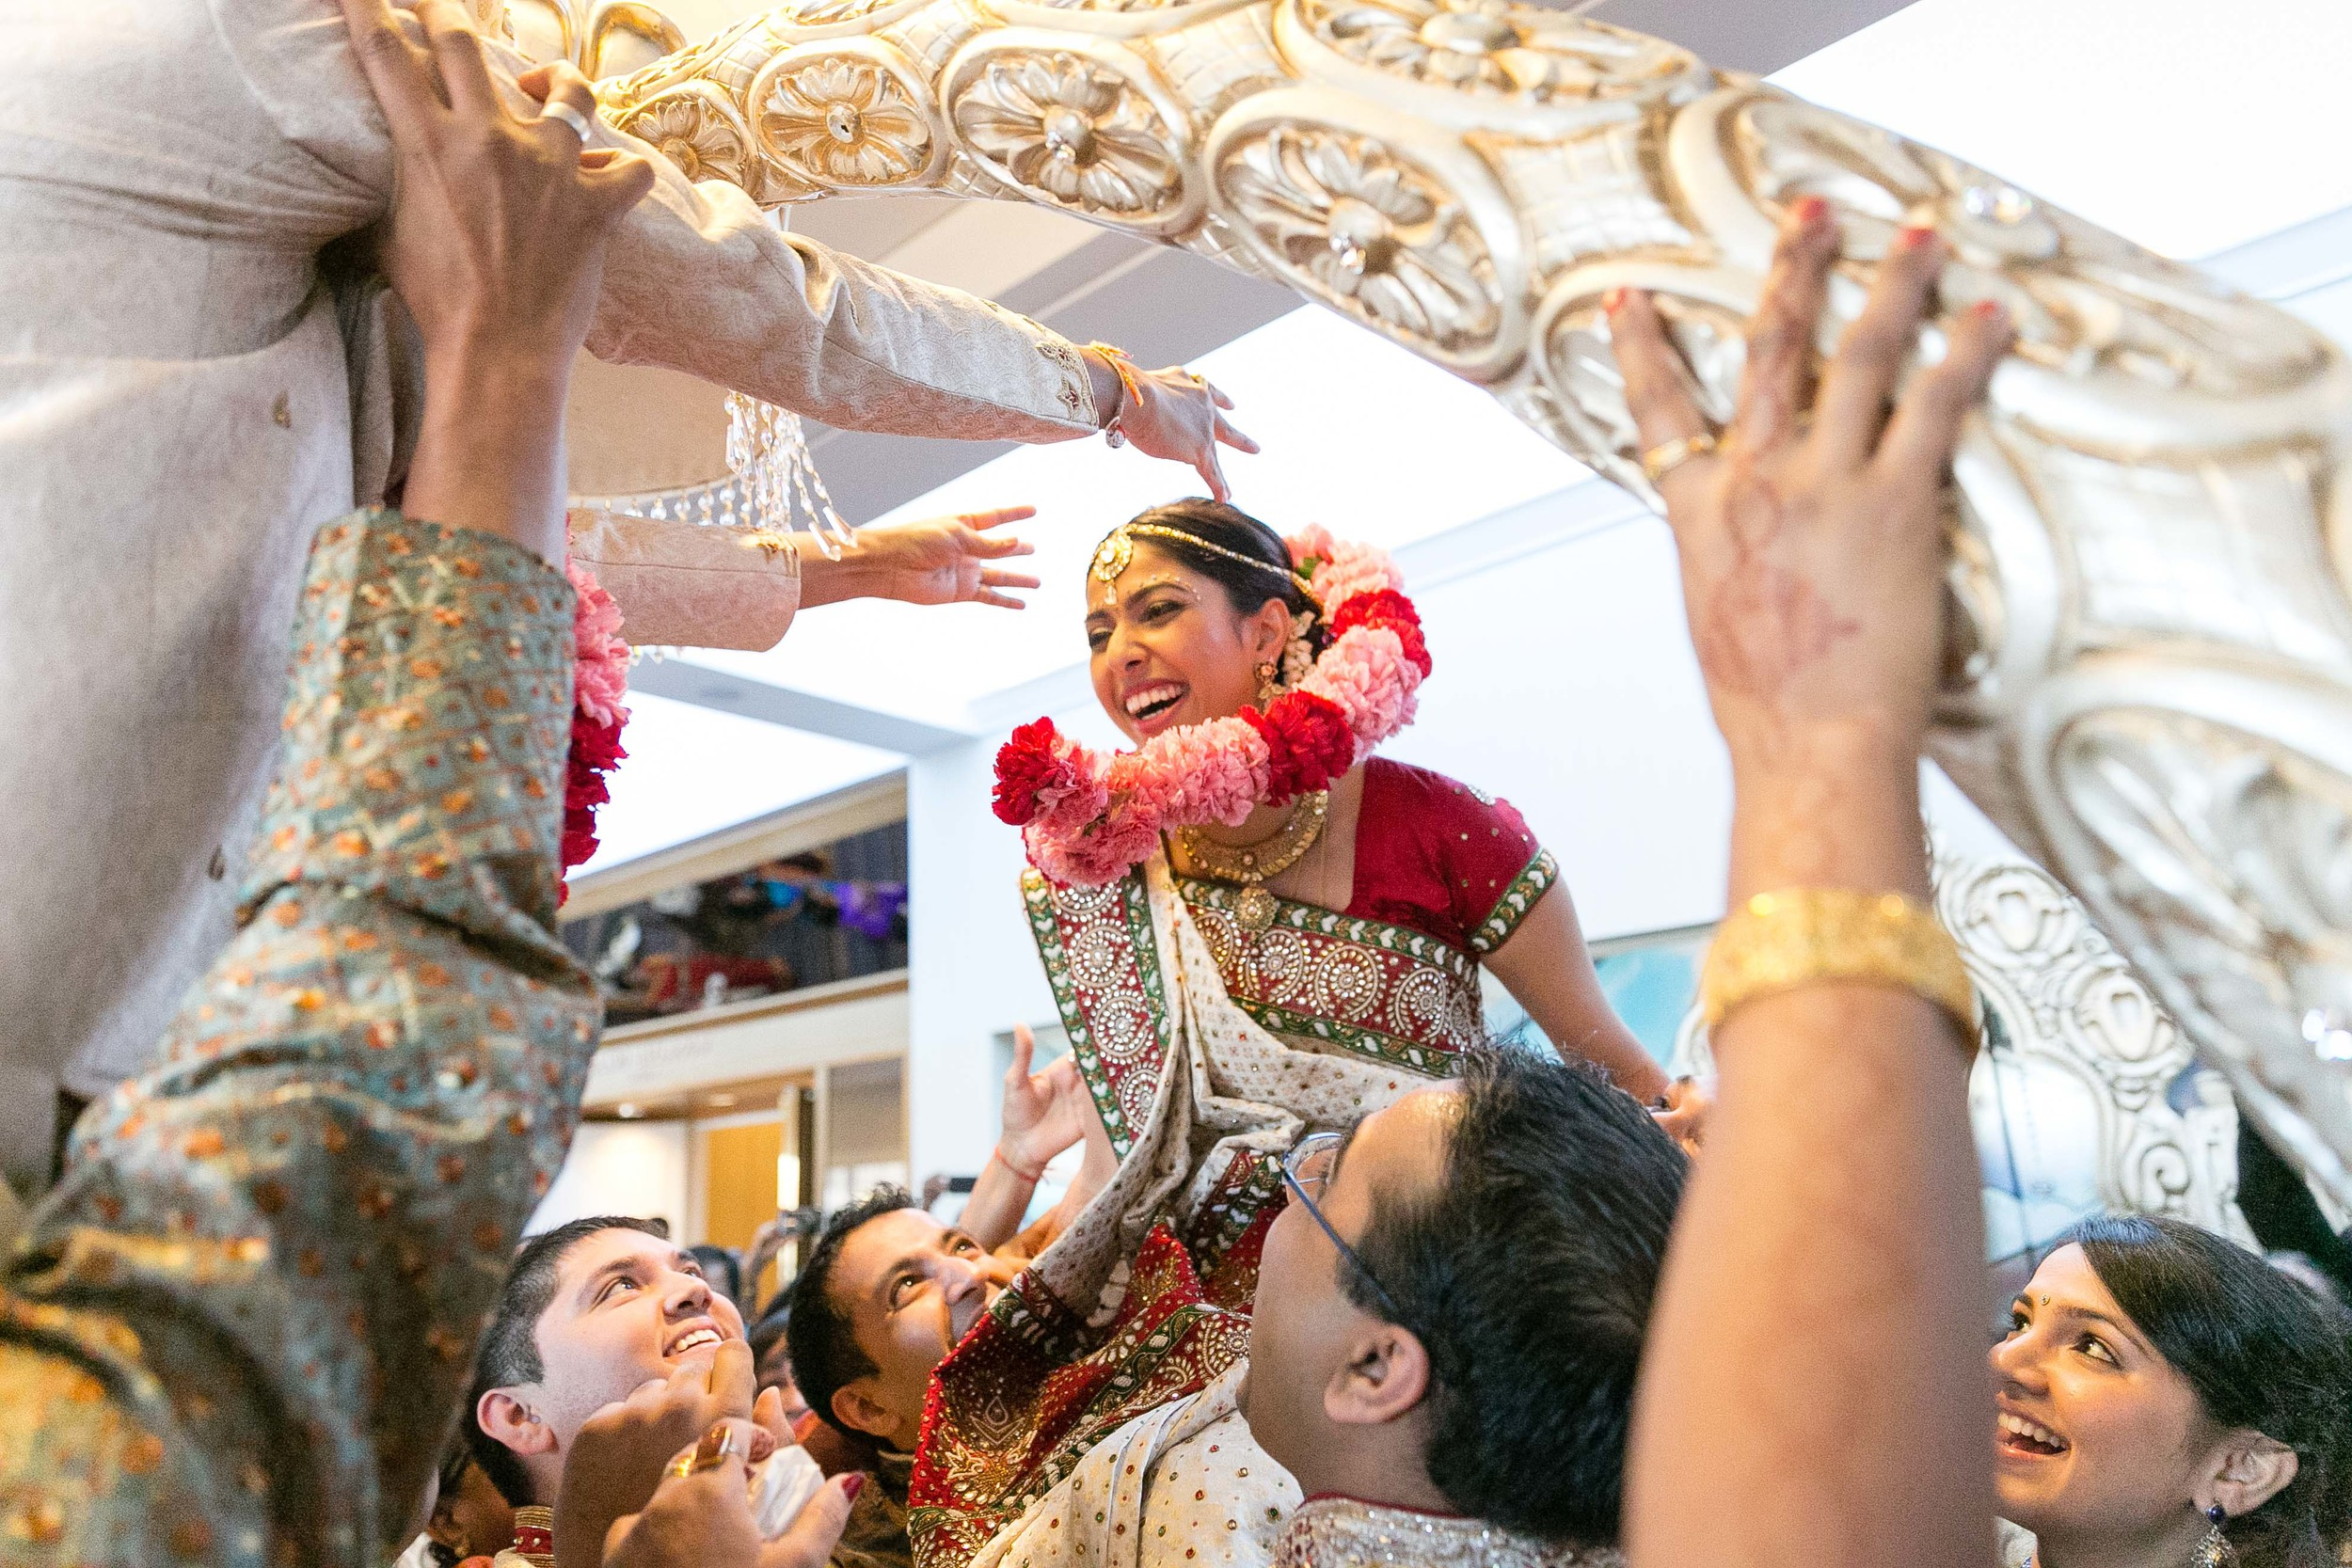 Luxurious-Indian-Wedding-Marriott-Boston-Massachusetts-Documentary-Wedding-Photography-by-Jacek-Dolata-15.jpg